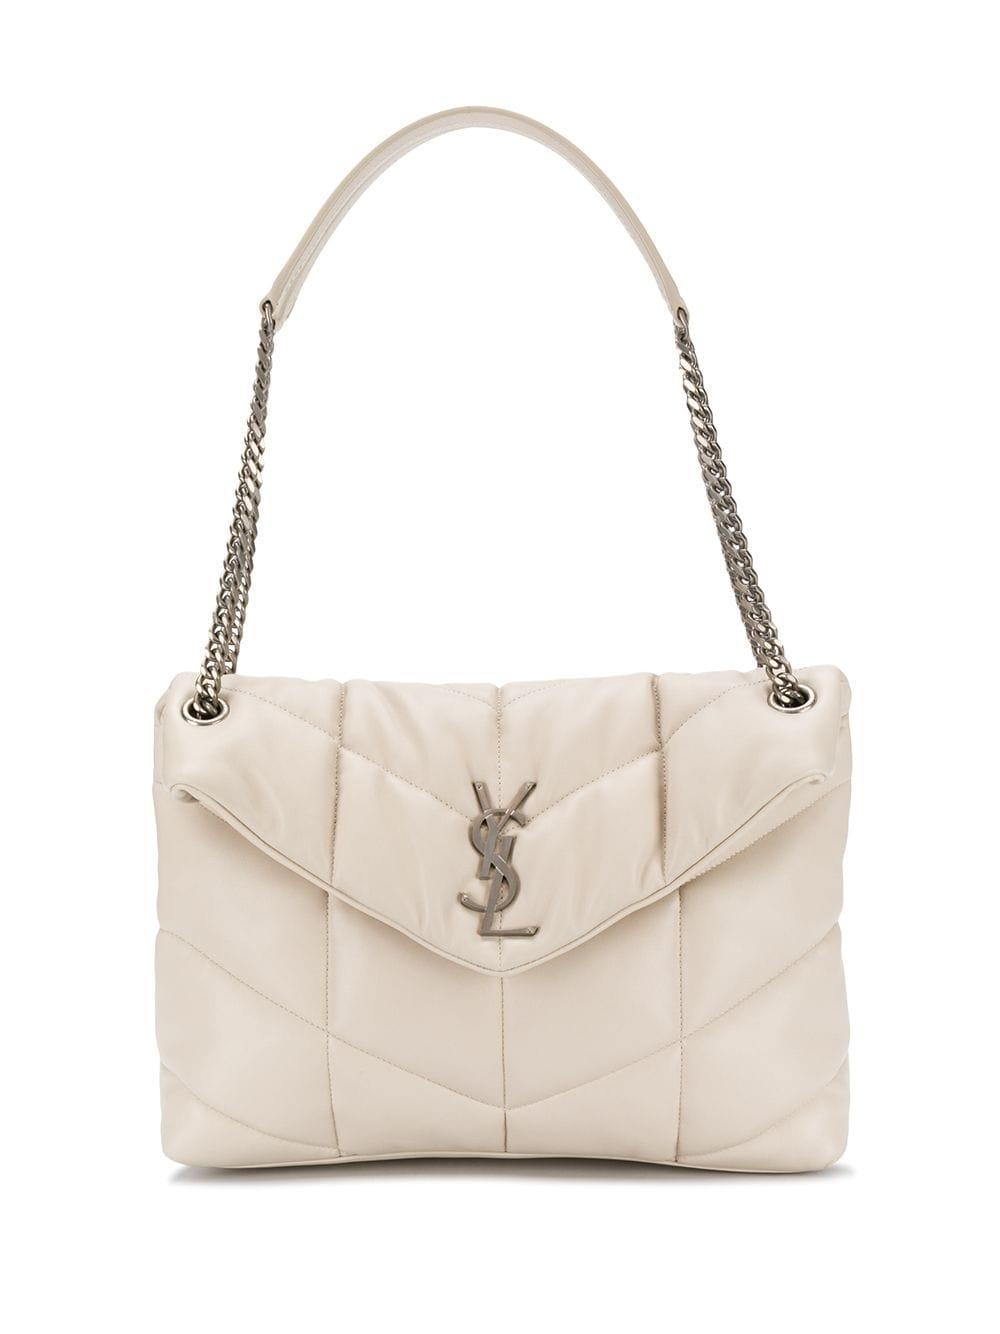 Picture of Saint Laurent | Loulou Medium Leather Shoulder Bag